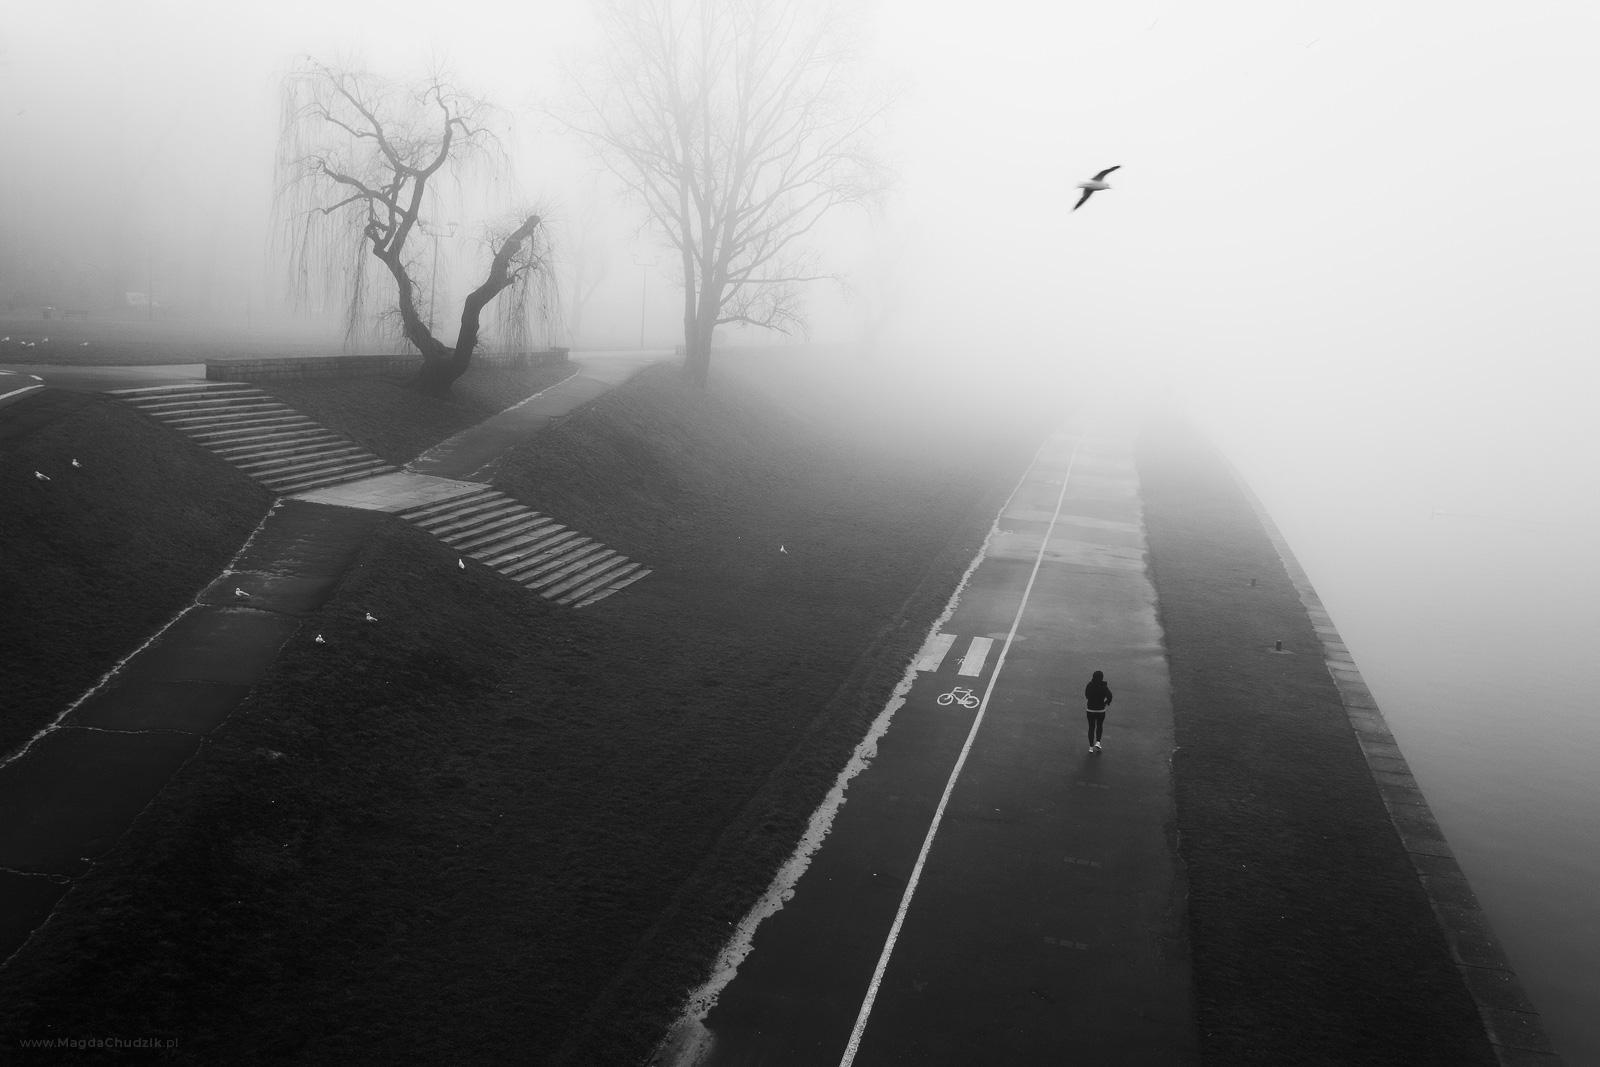 magda-chudzik-street-photography-poland-krakow-050